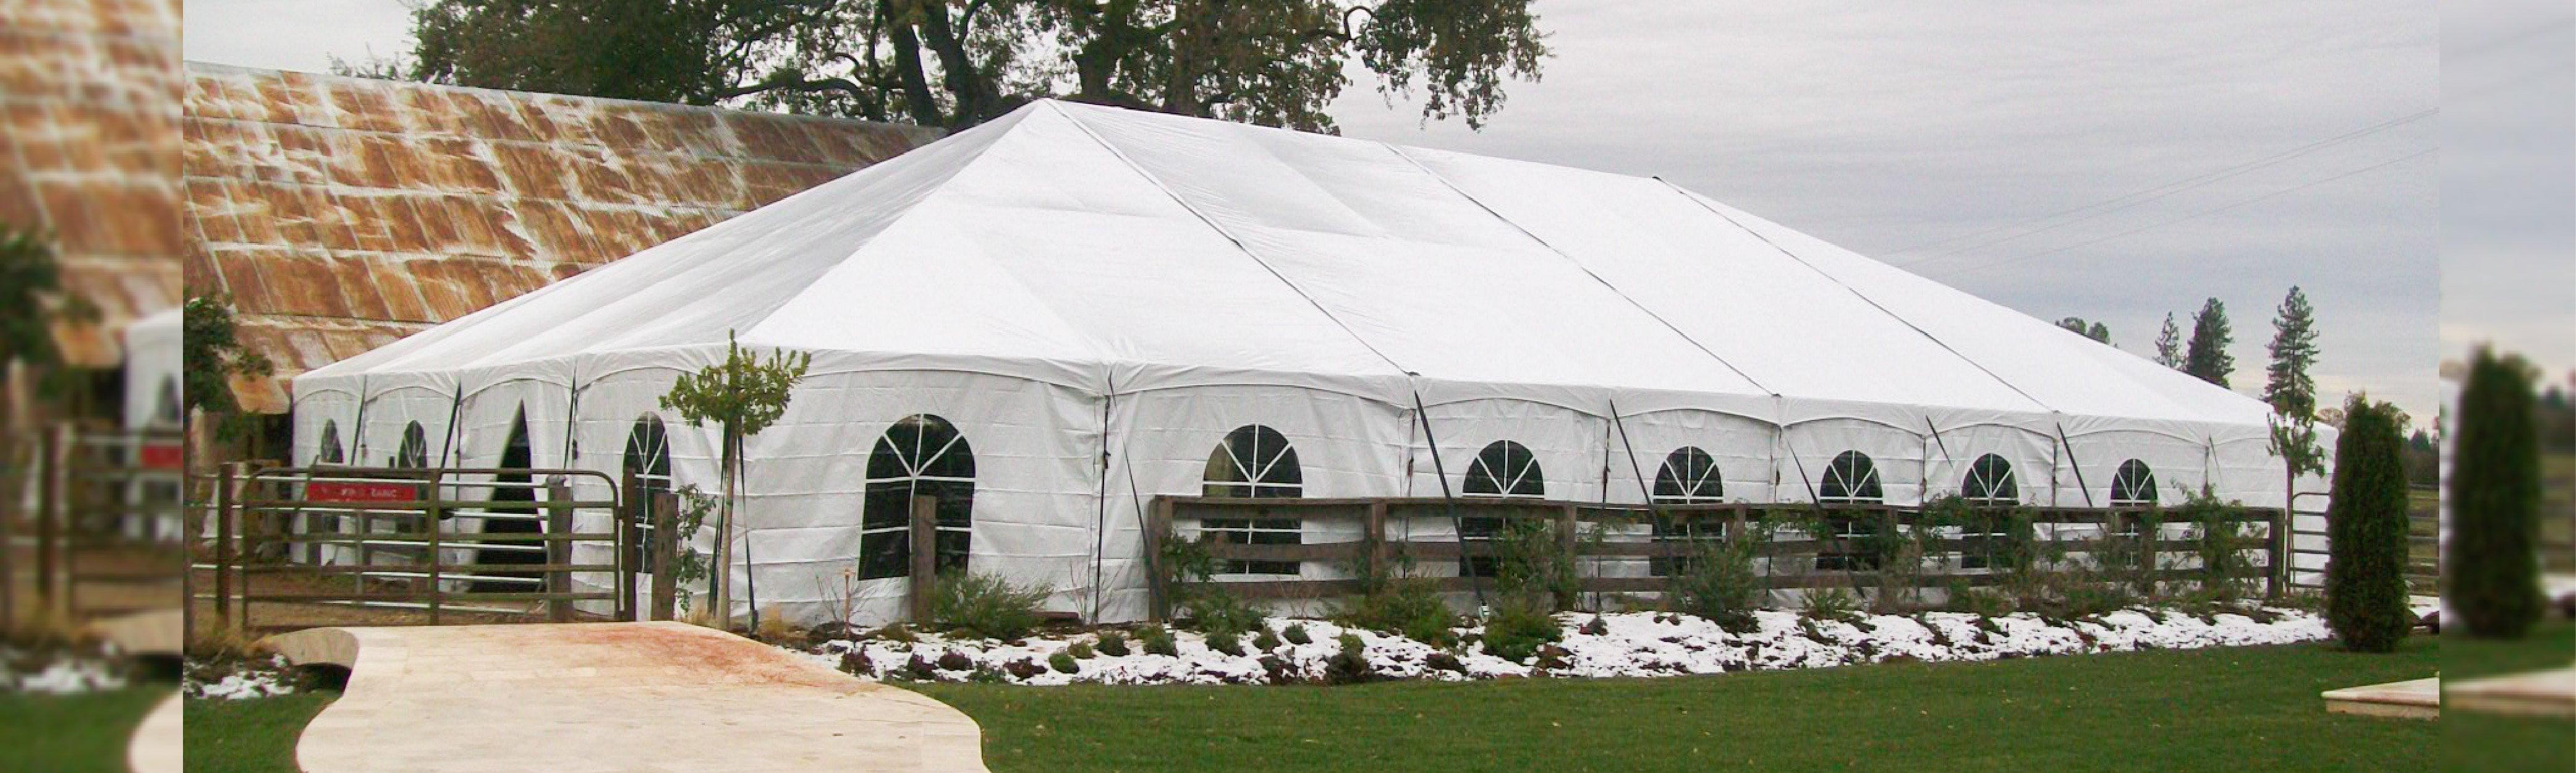 Tent_rental_White_Tent-01.jpg